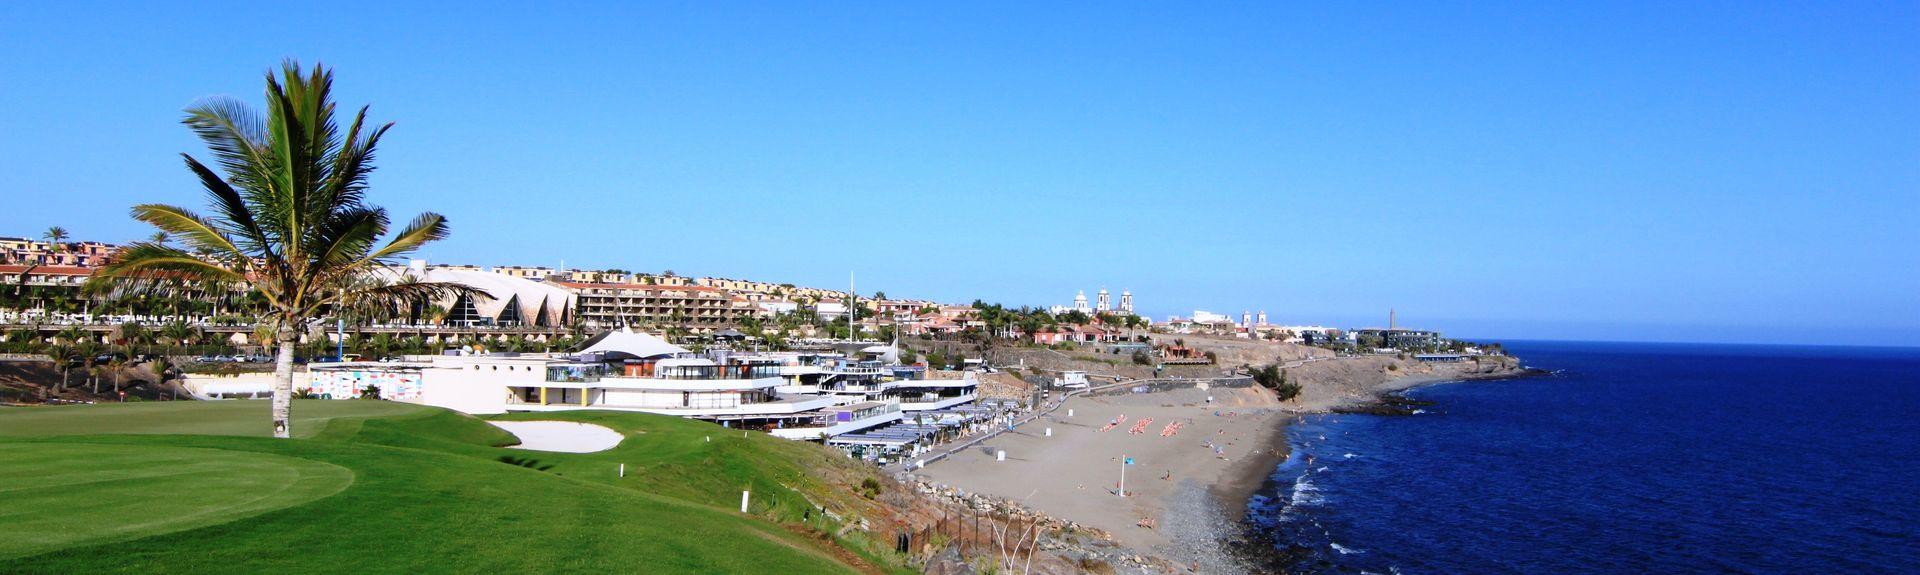 Salobre Golf Resort, San Bartolomé de Tirajana, Canarische Eilanden, Spanje